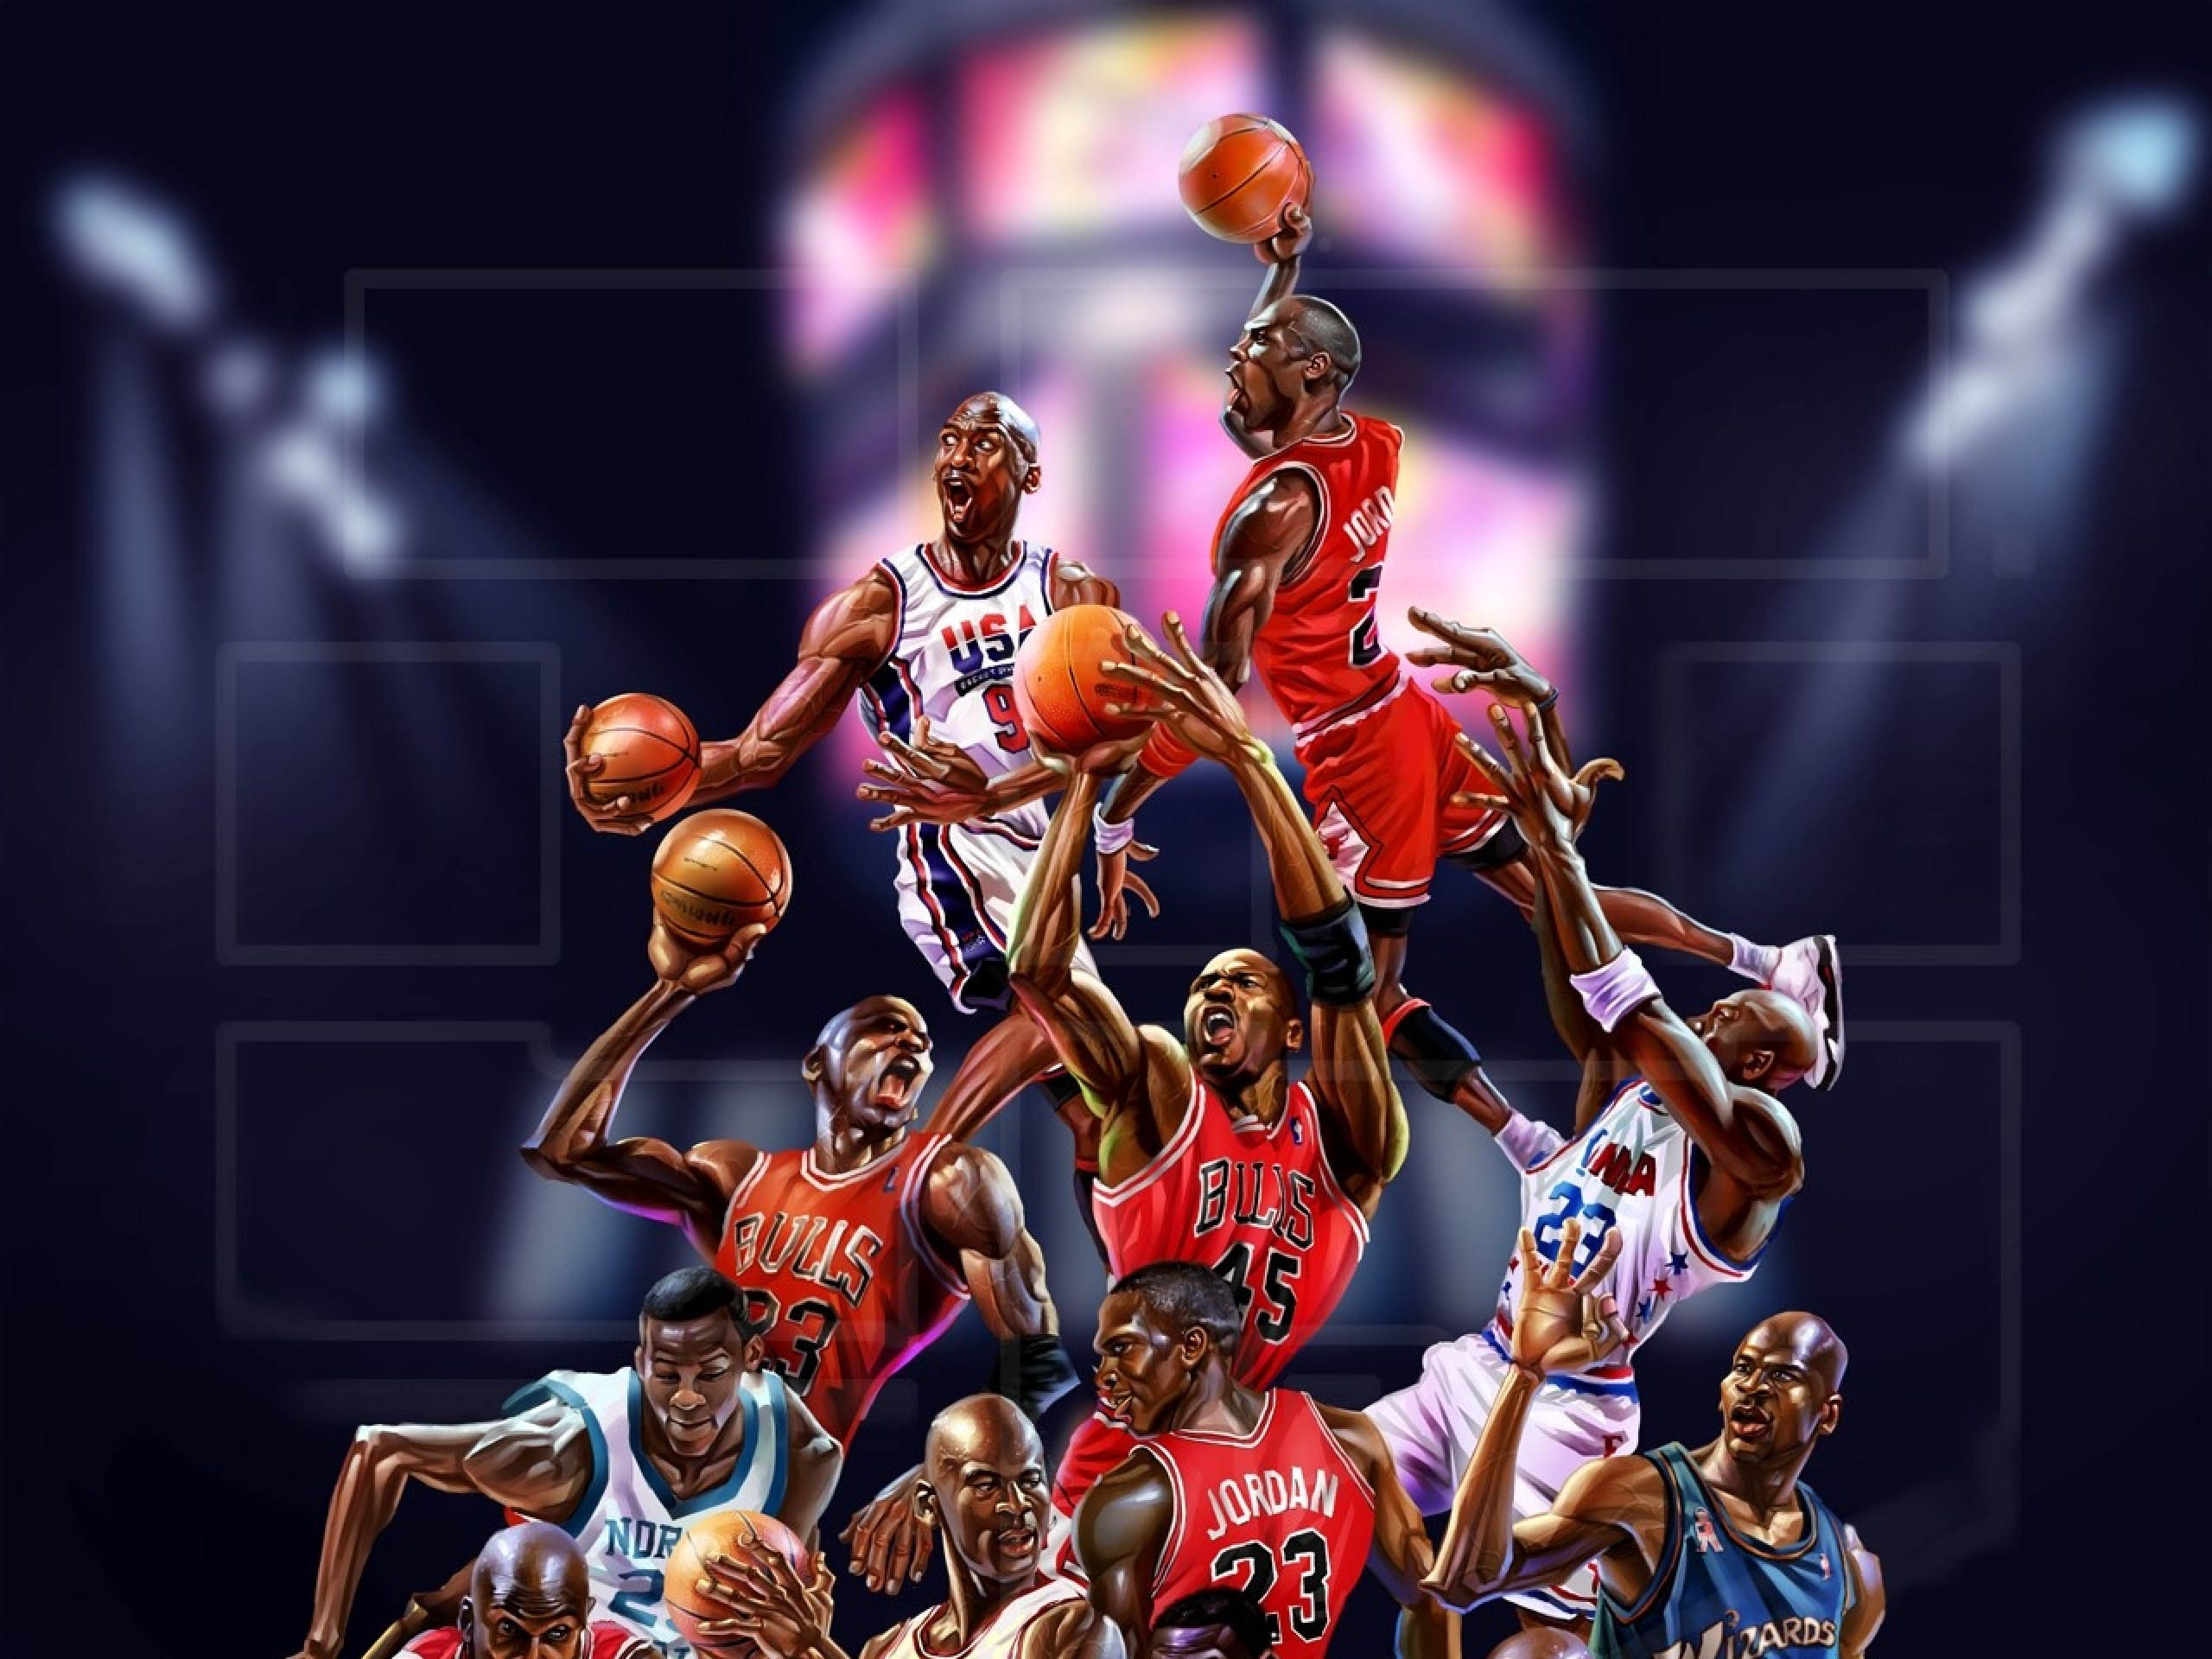 Michael Jordan Cartoon Wallpapers Top Free Michael Jordan Cartoon Backgrounds Wallpaperaccess